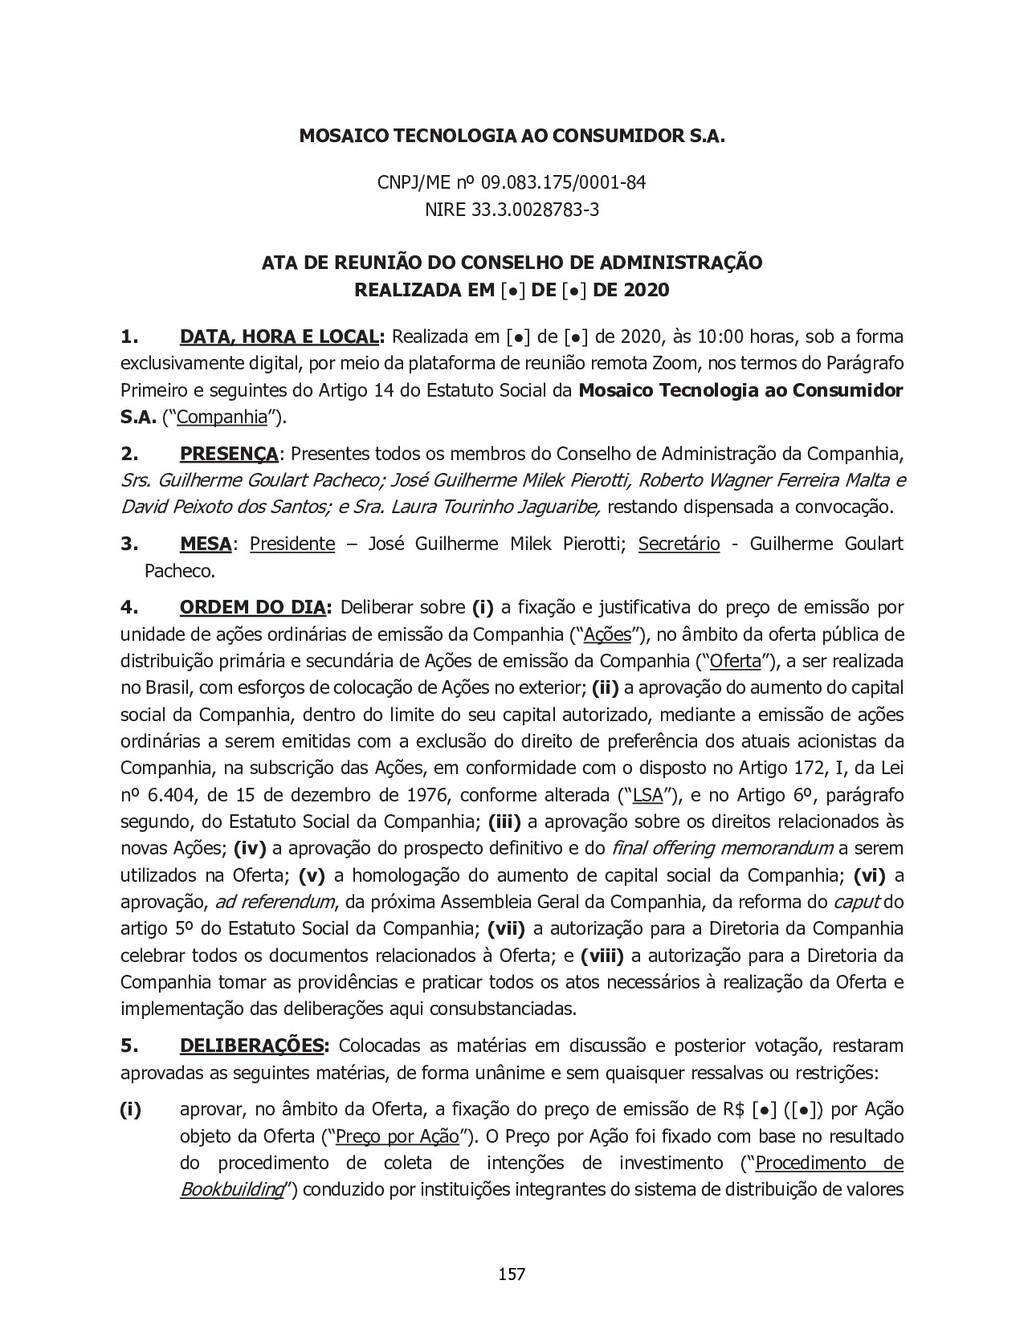 MOSAICO TECNOLOGIA AO CONSUMIDOR S.A. CNPJ/ME n...